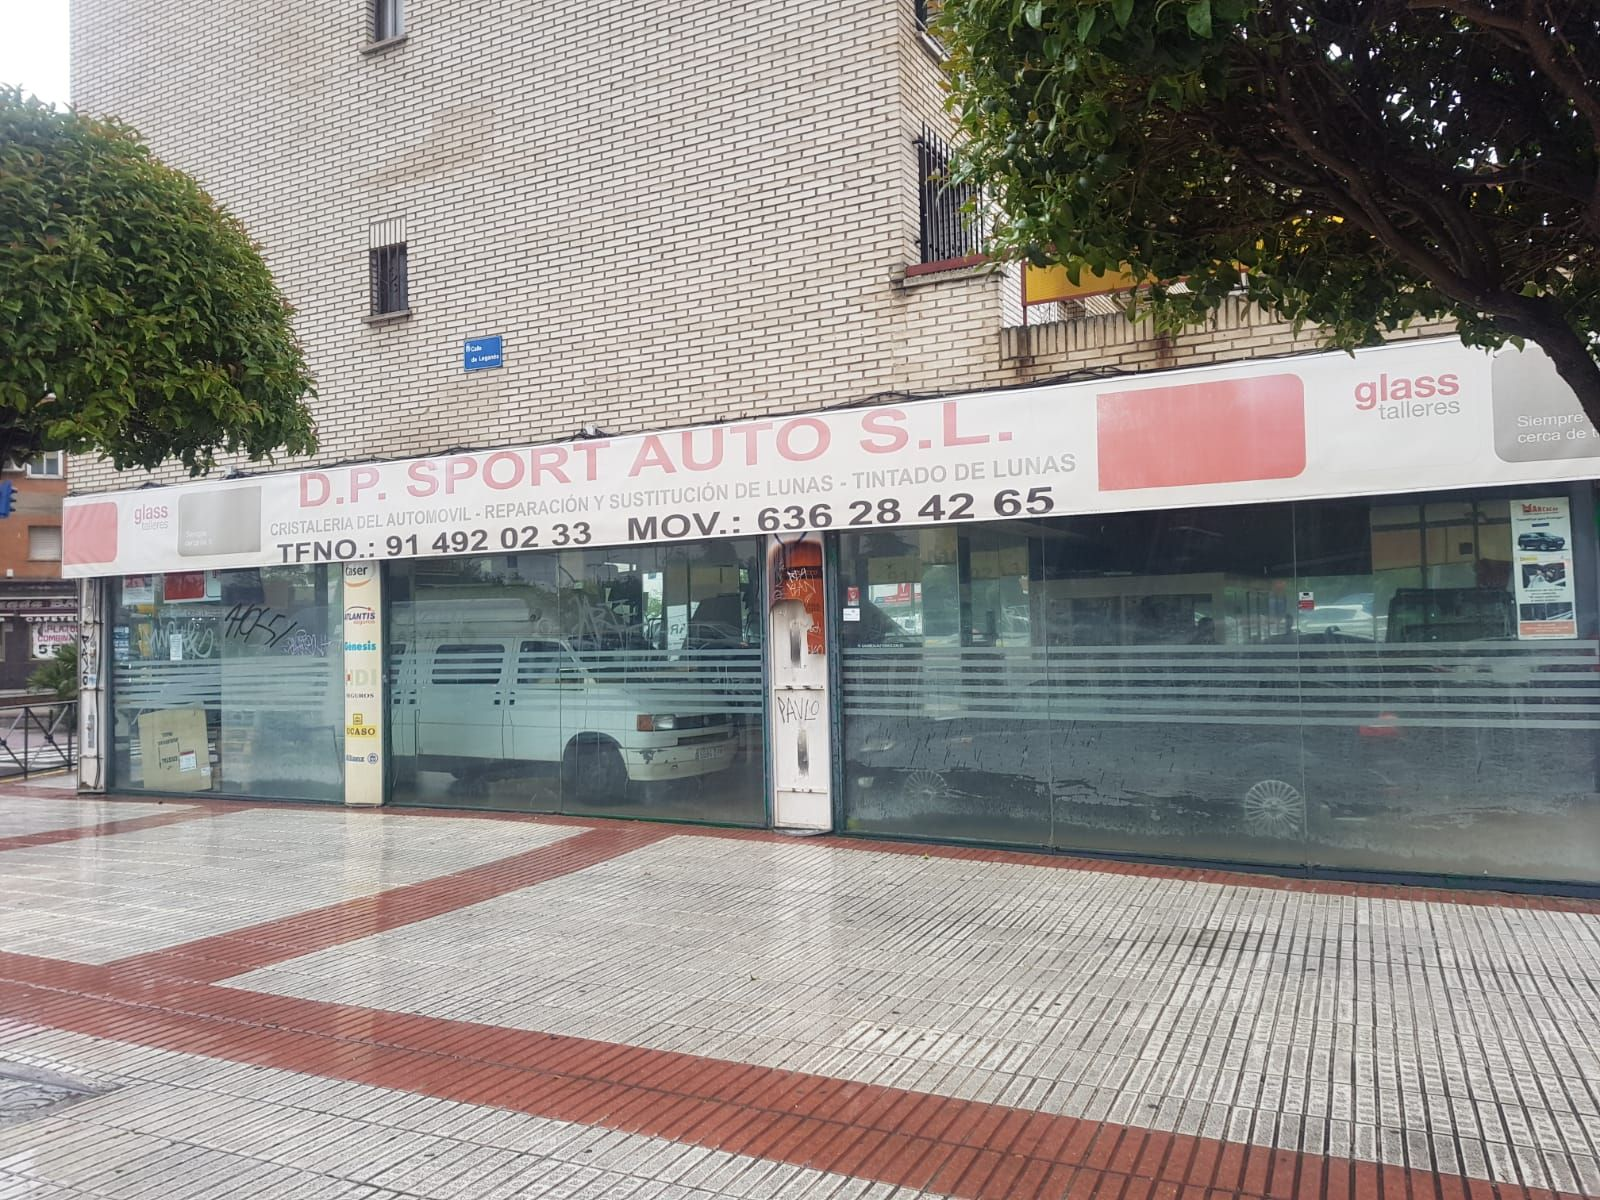 D.P. Sport Auto Fuenlabrada